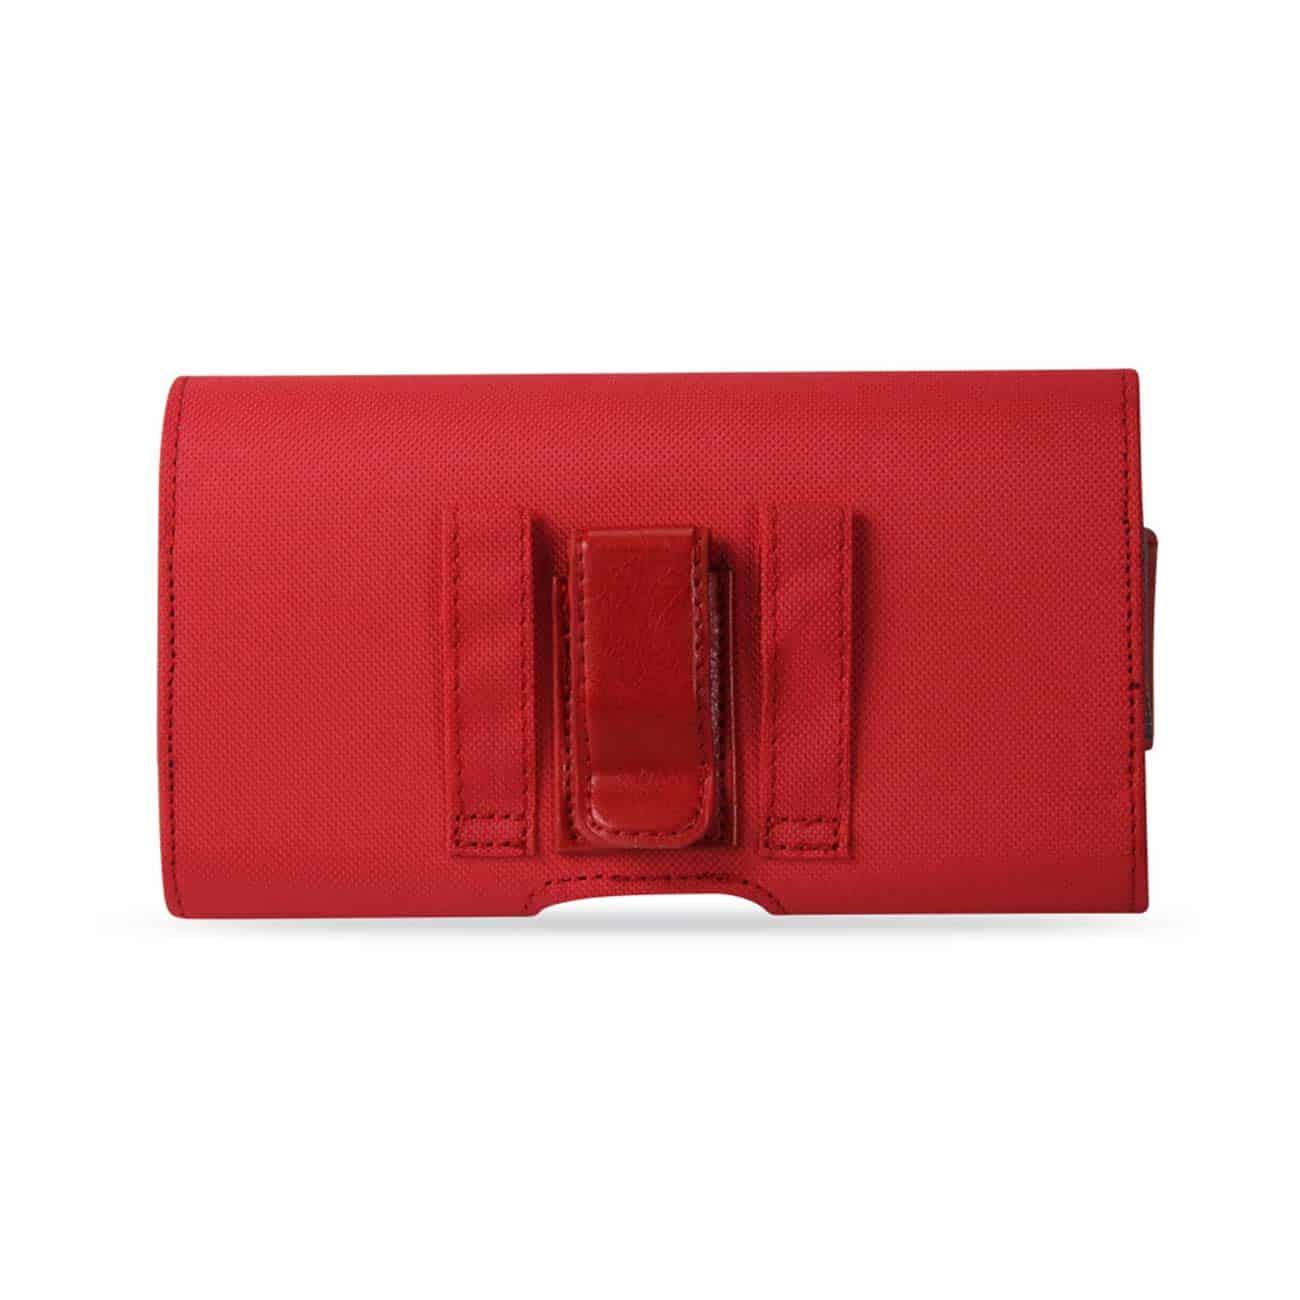 HORIZONTA RUGGED POUCH SAMSUNG GALAXY S5/ SM-G900A/ G900V/ G9 0P/ G900T/ G900M/ G900R4 PLUS RED